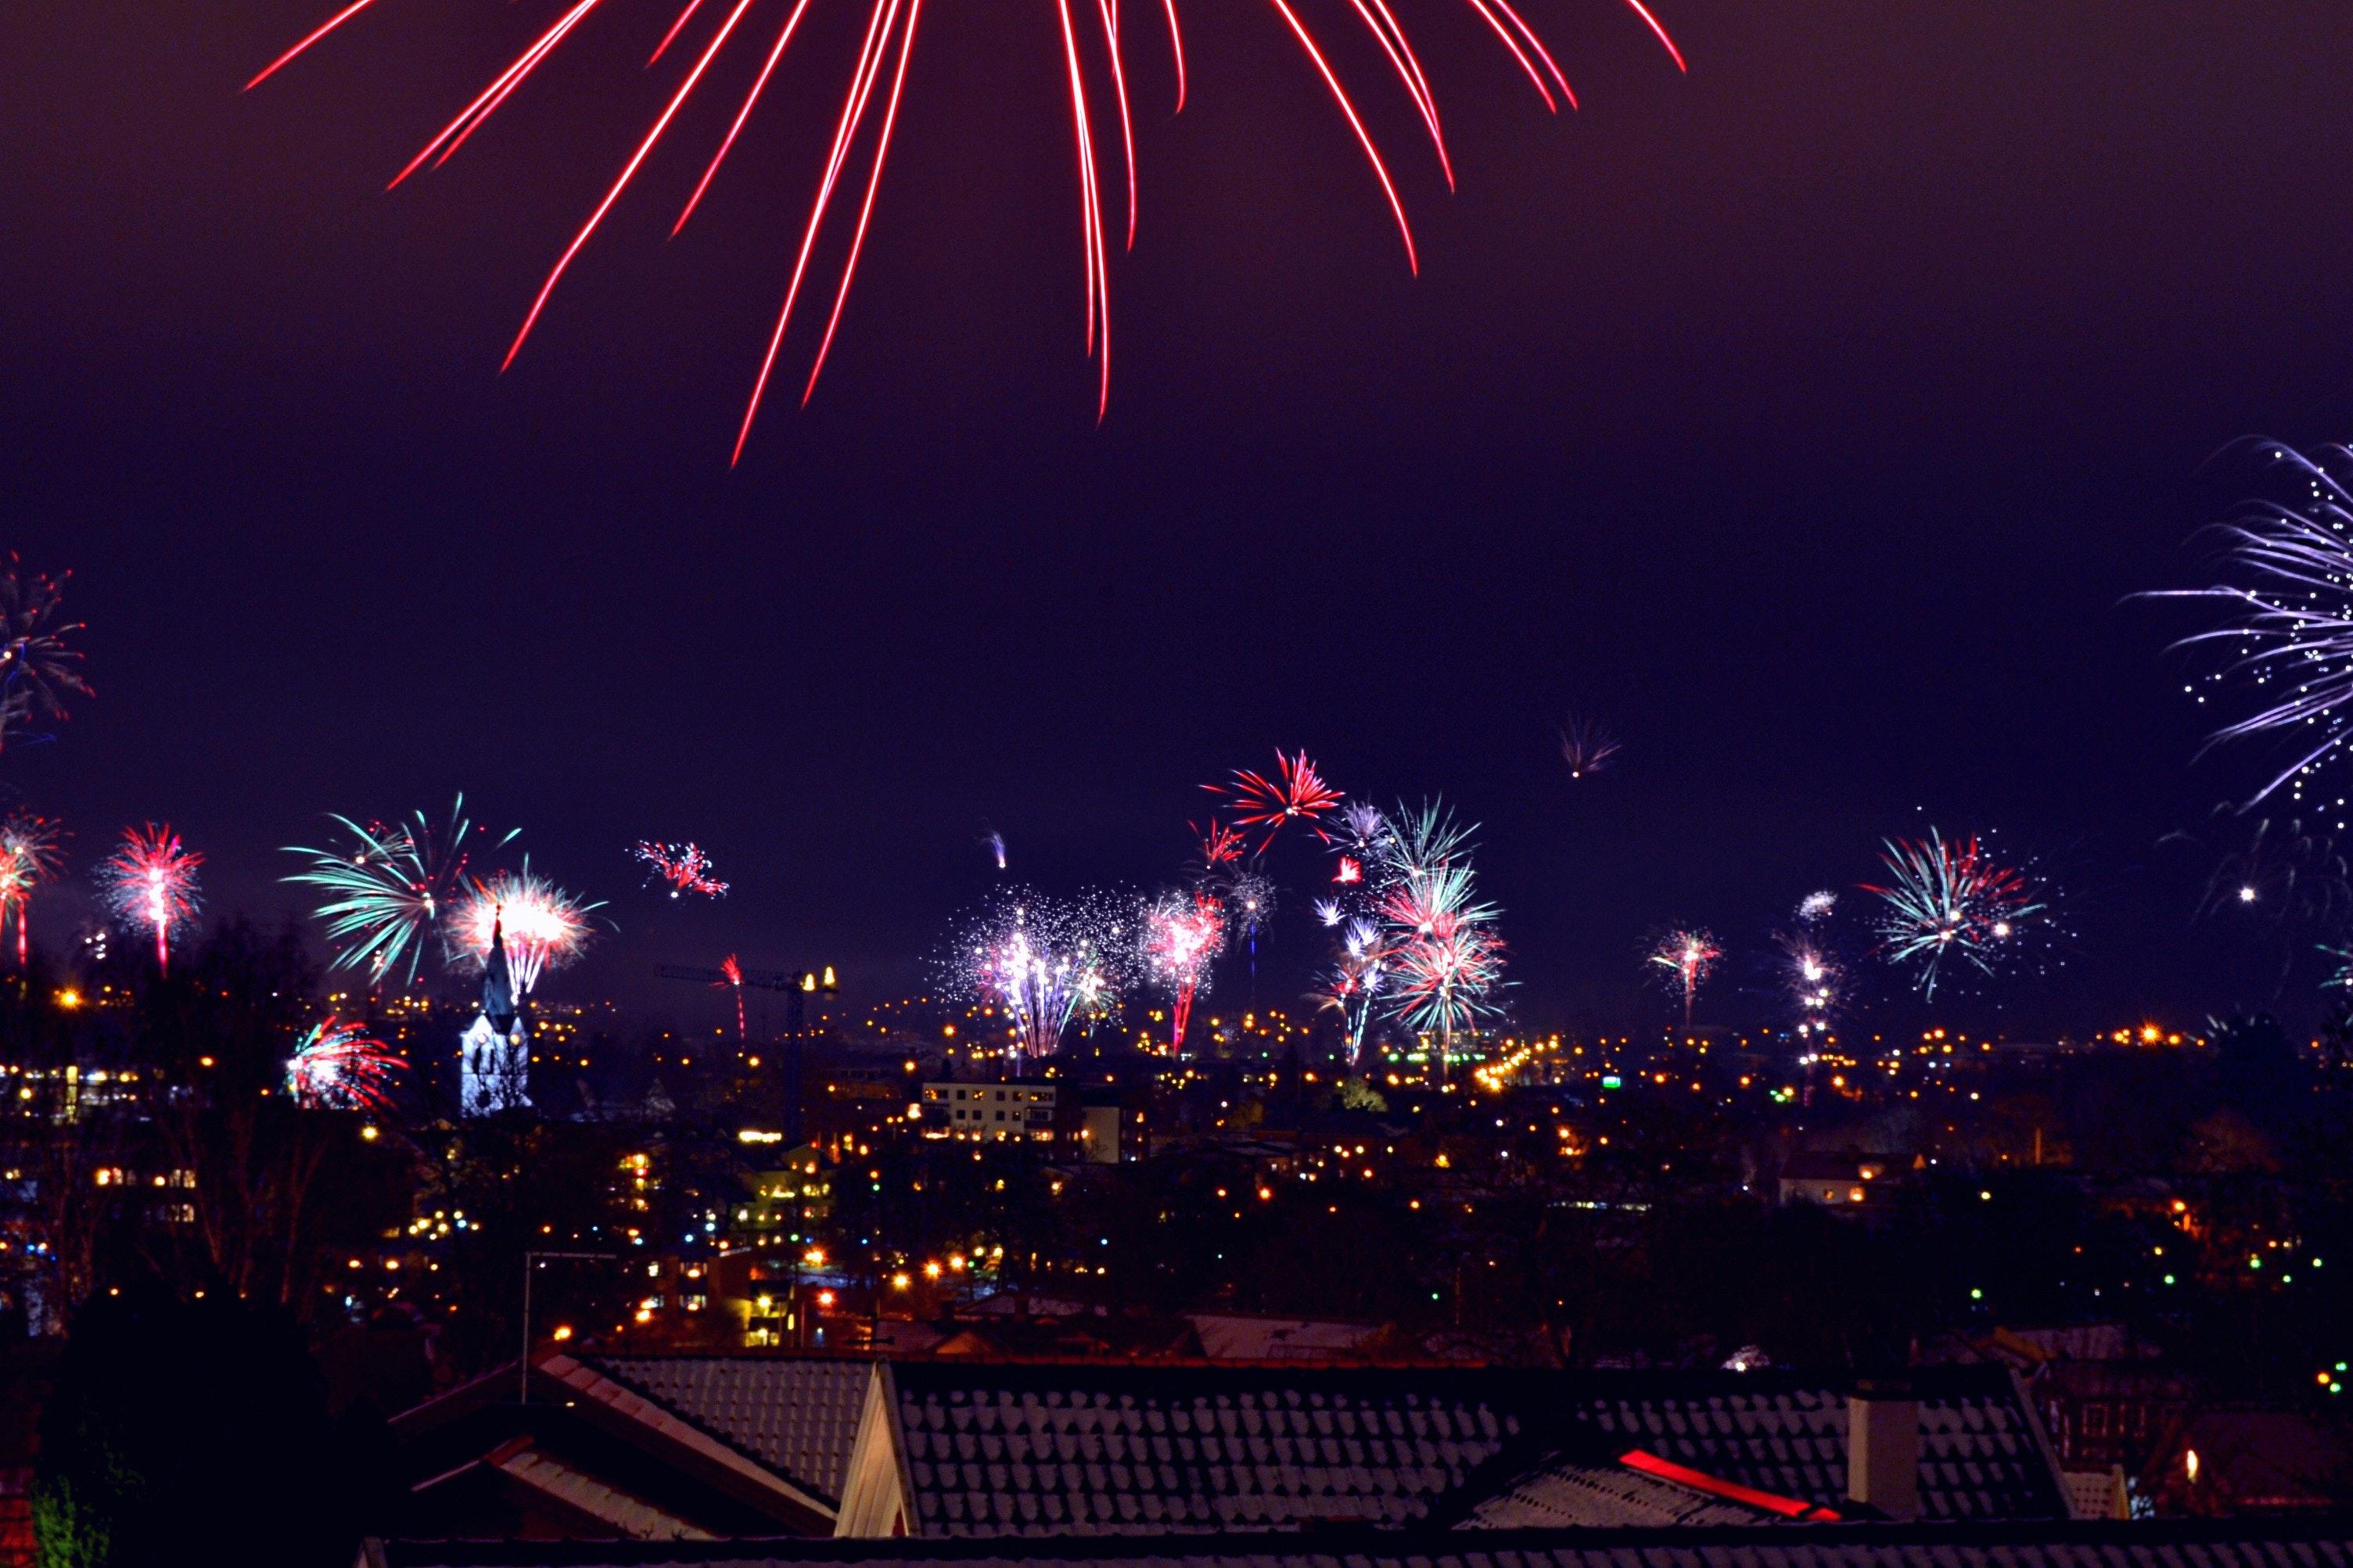 100 Great Fireworks Photos 183 Pexels 183 Free Stock Photos